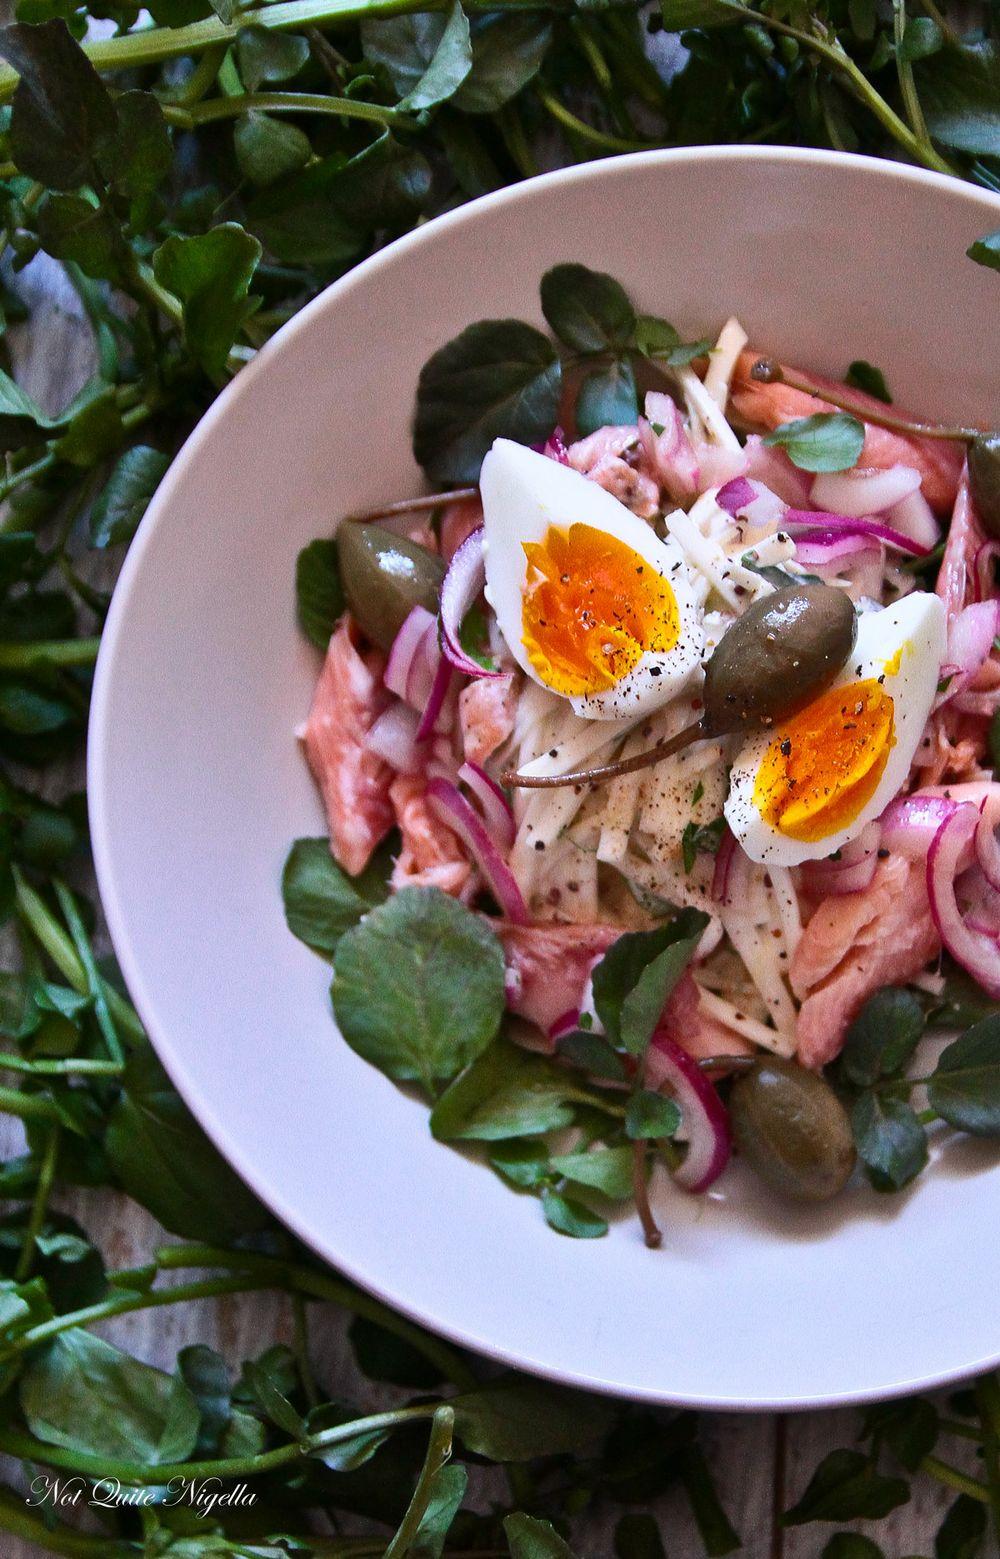 Smoked Trout, Celeriac & Watercress Salad